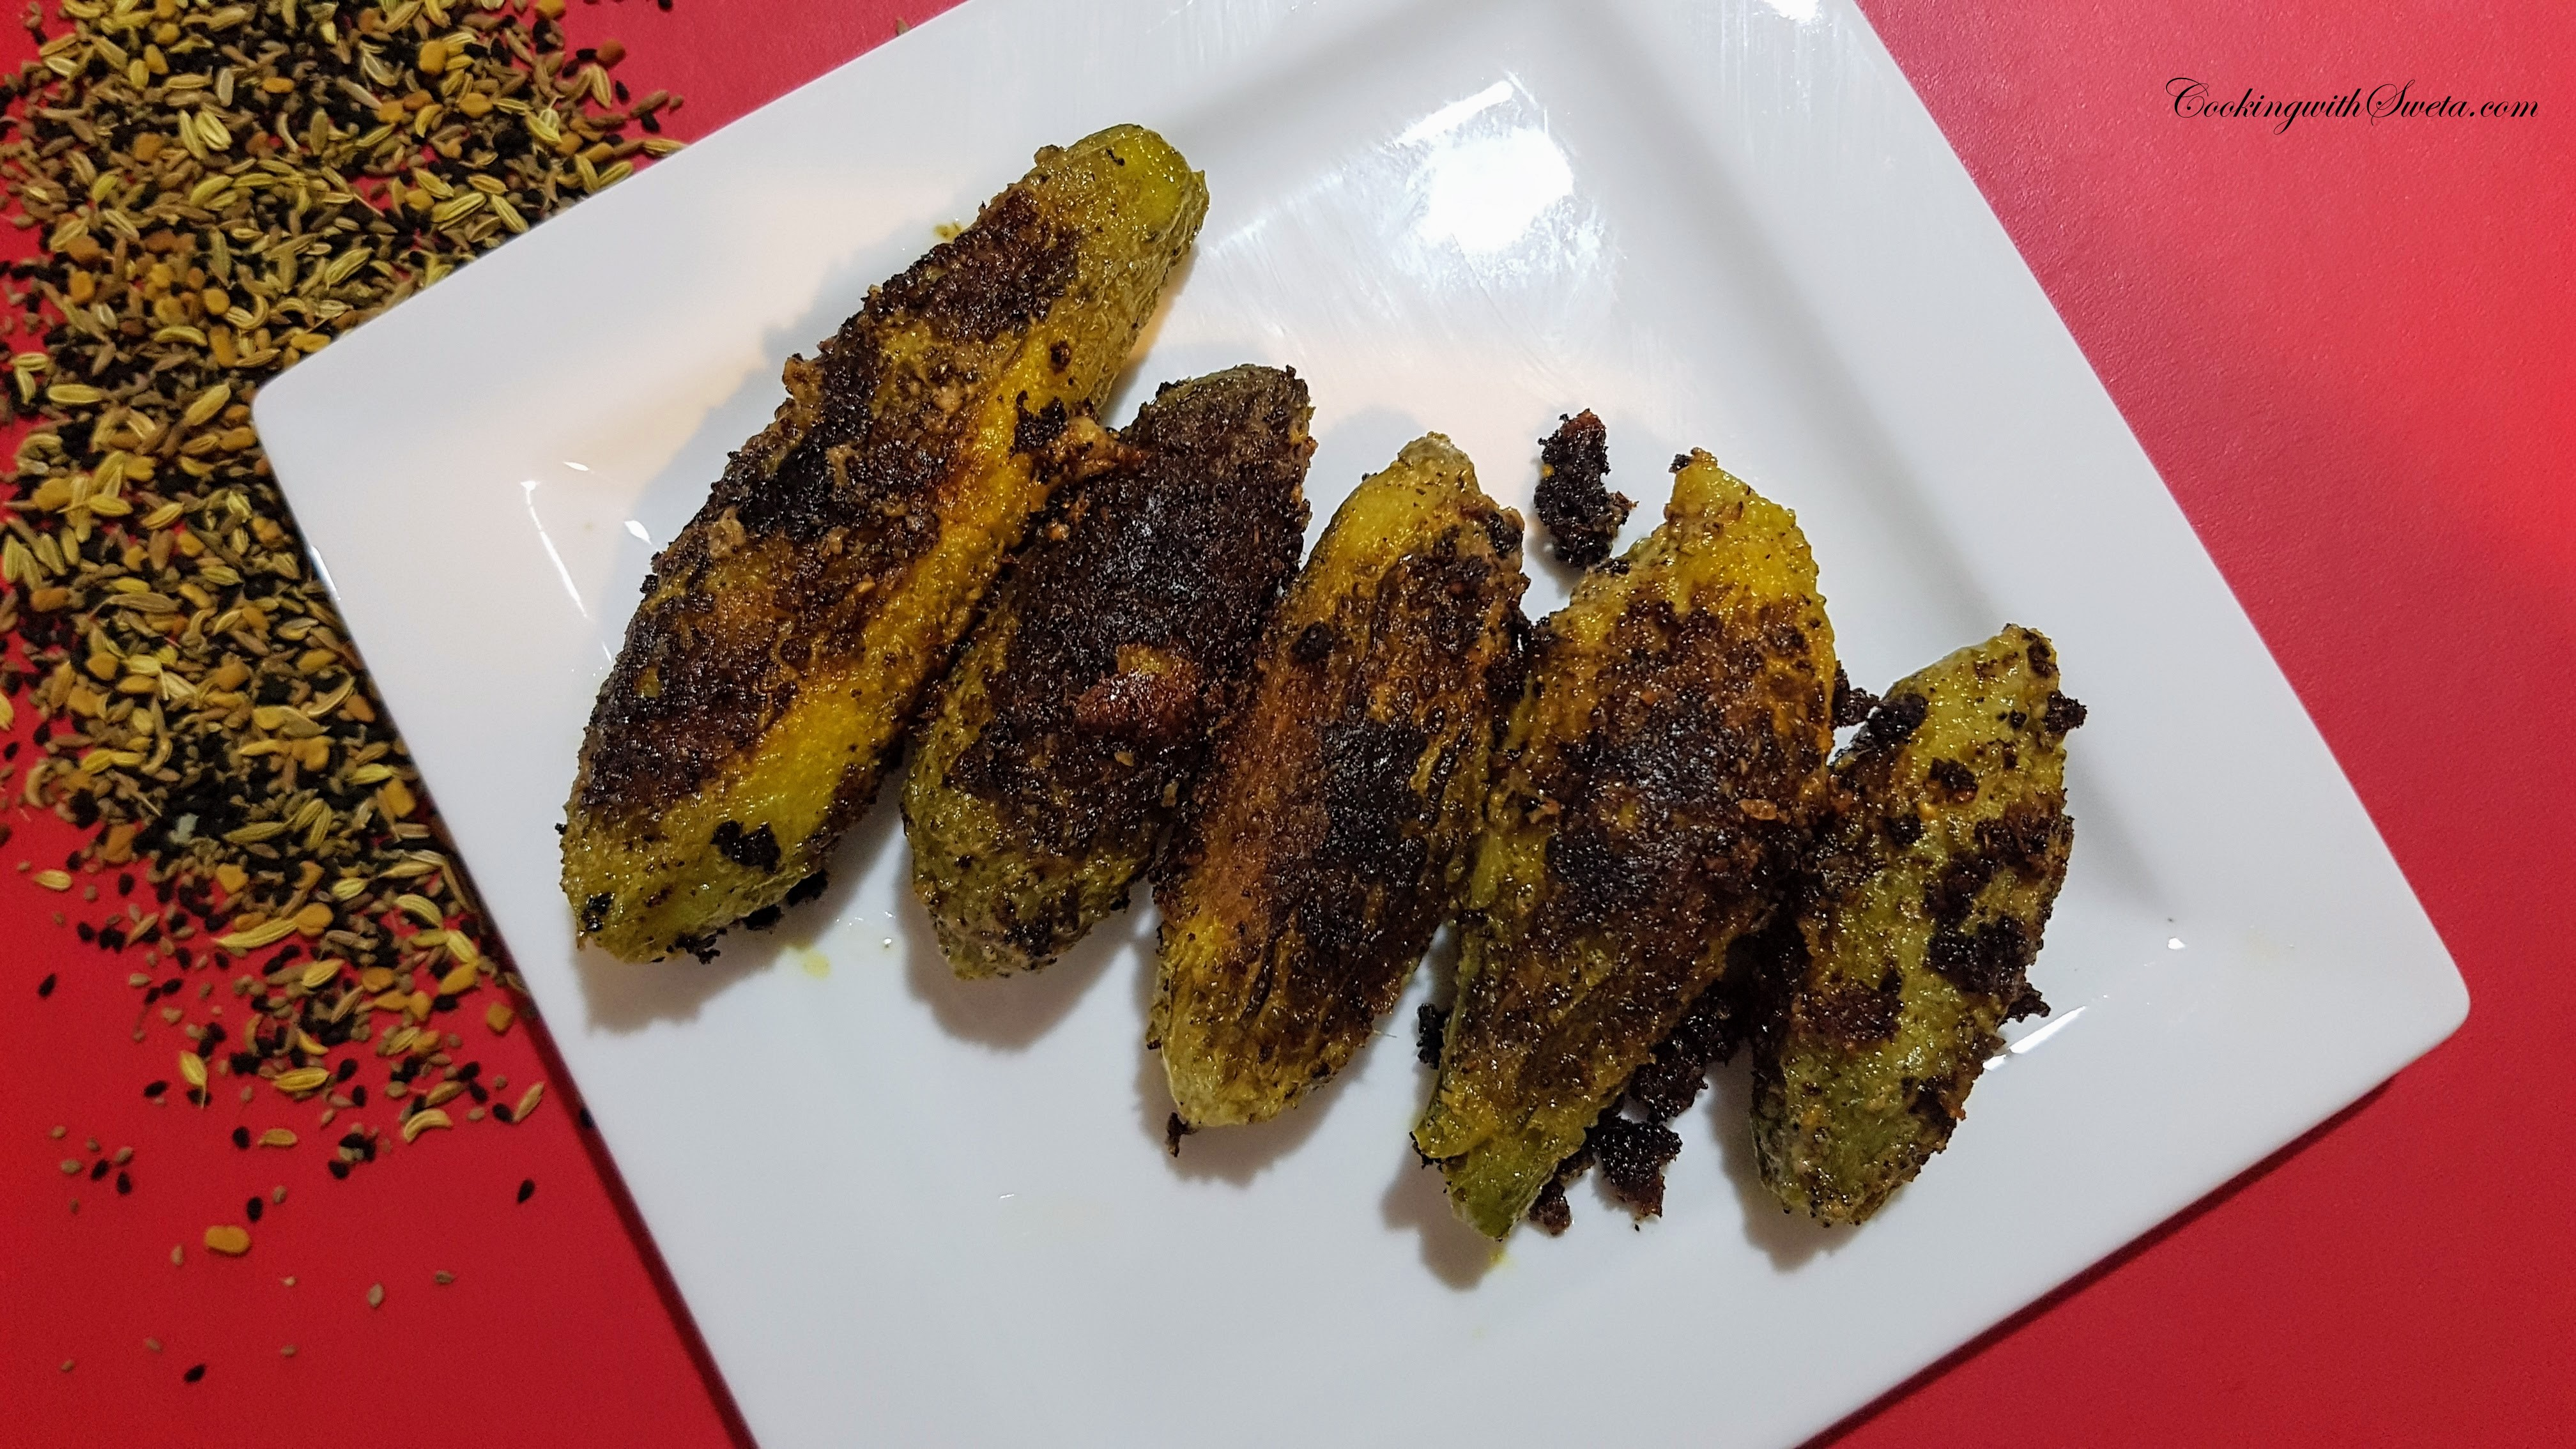 Cooking-with-sweta-karele-ki-kalonji